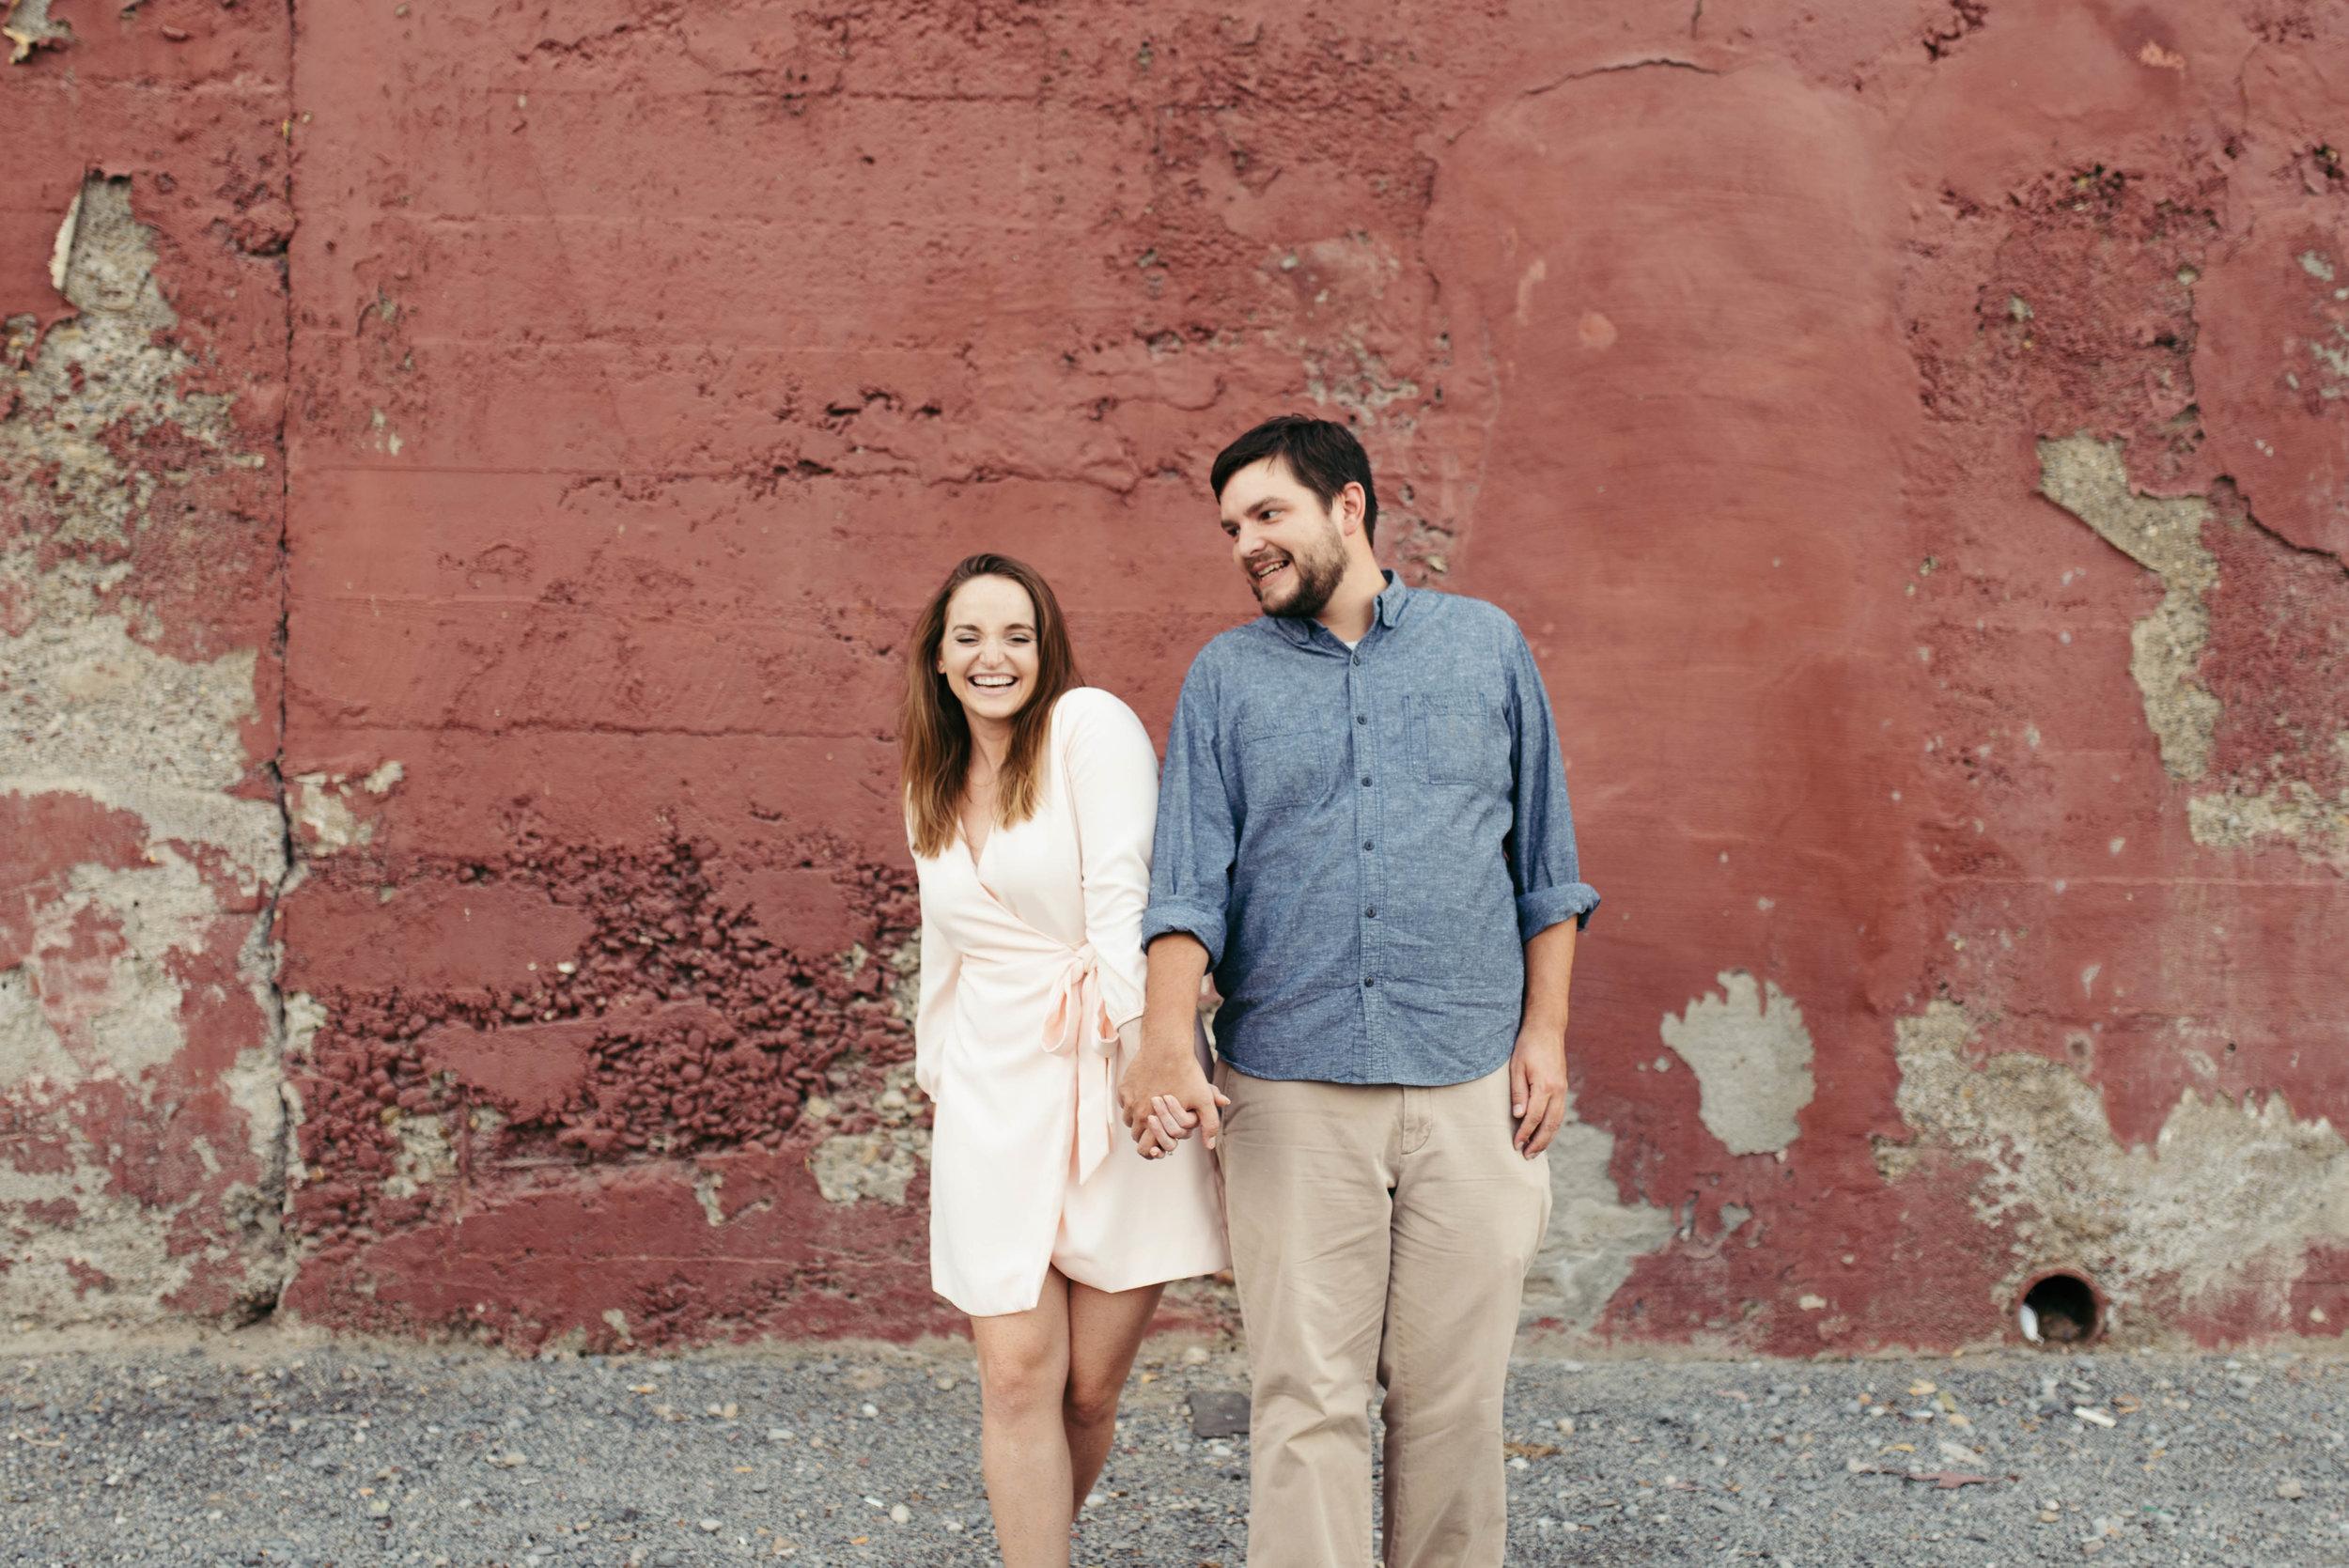 pittsburgh engagement photos-15.jpg